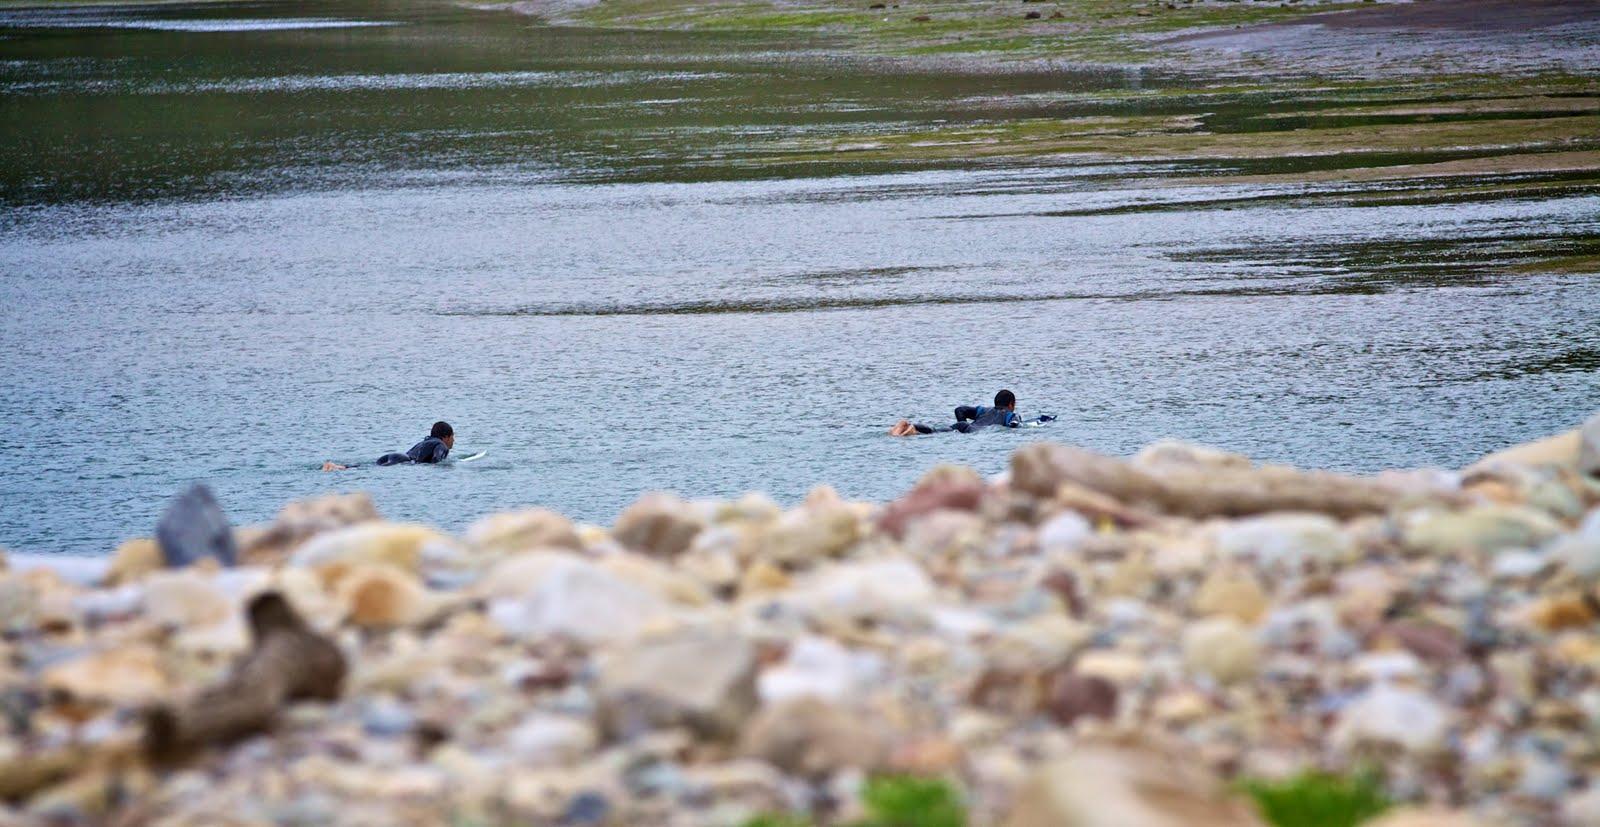 Julio Reguero y Fernando Ferrao saliendo del agua. Foto Fhana http://ramenendez.blogspot.com/